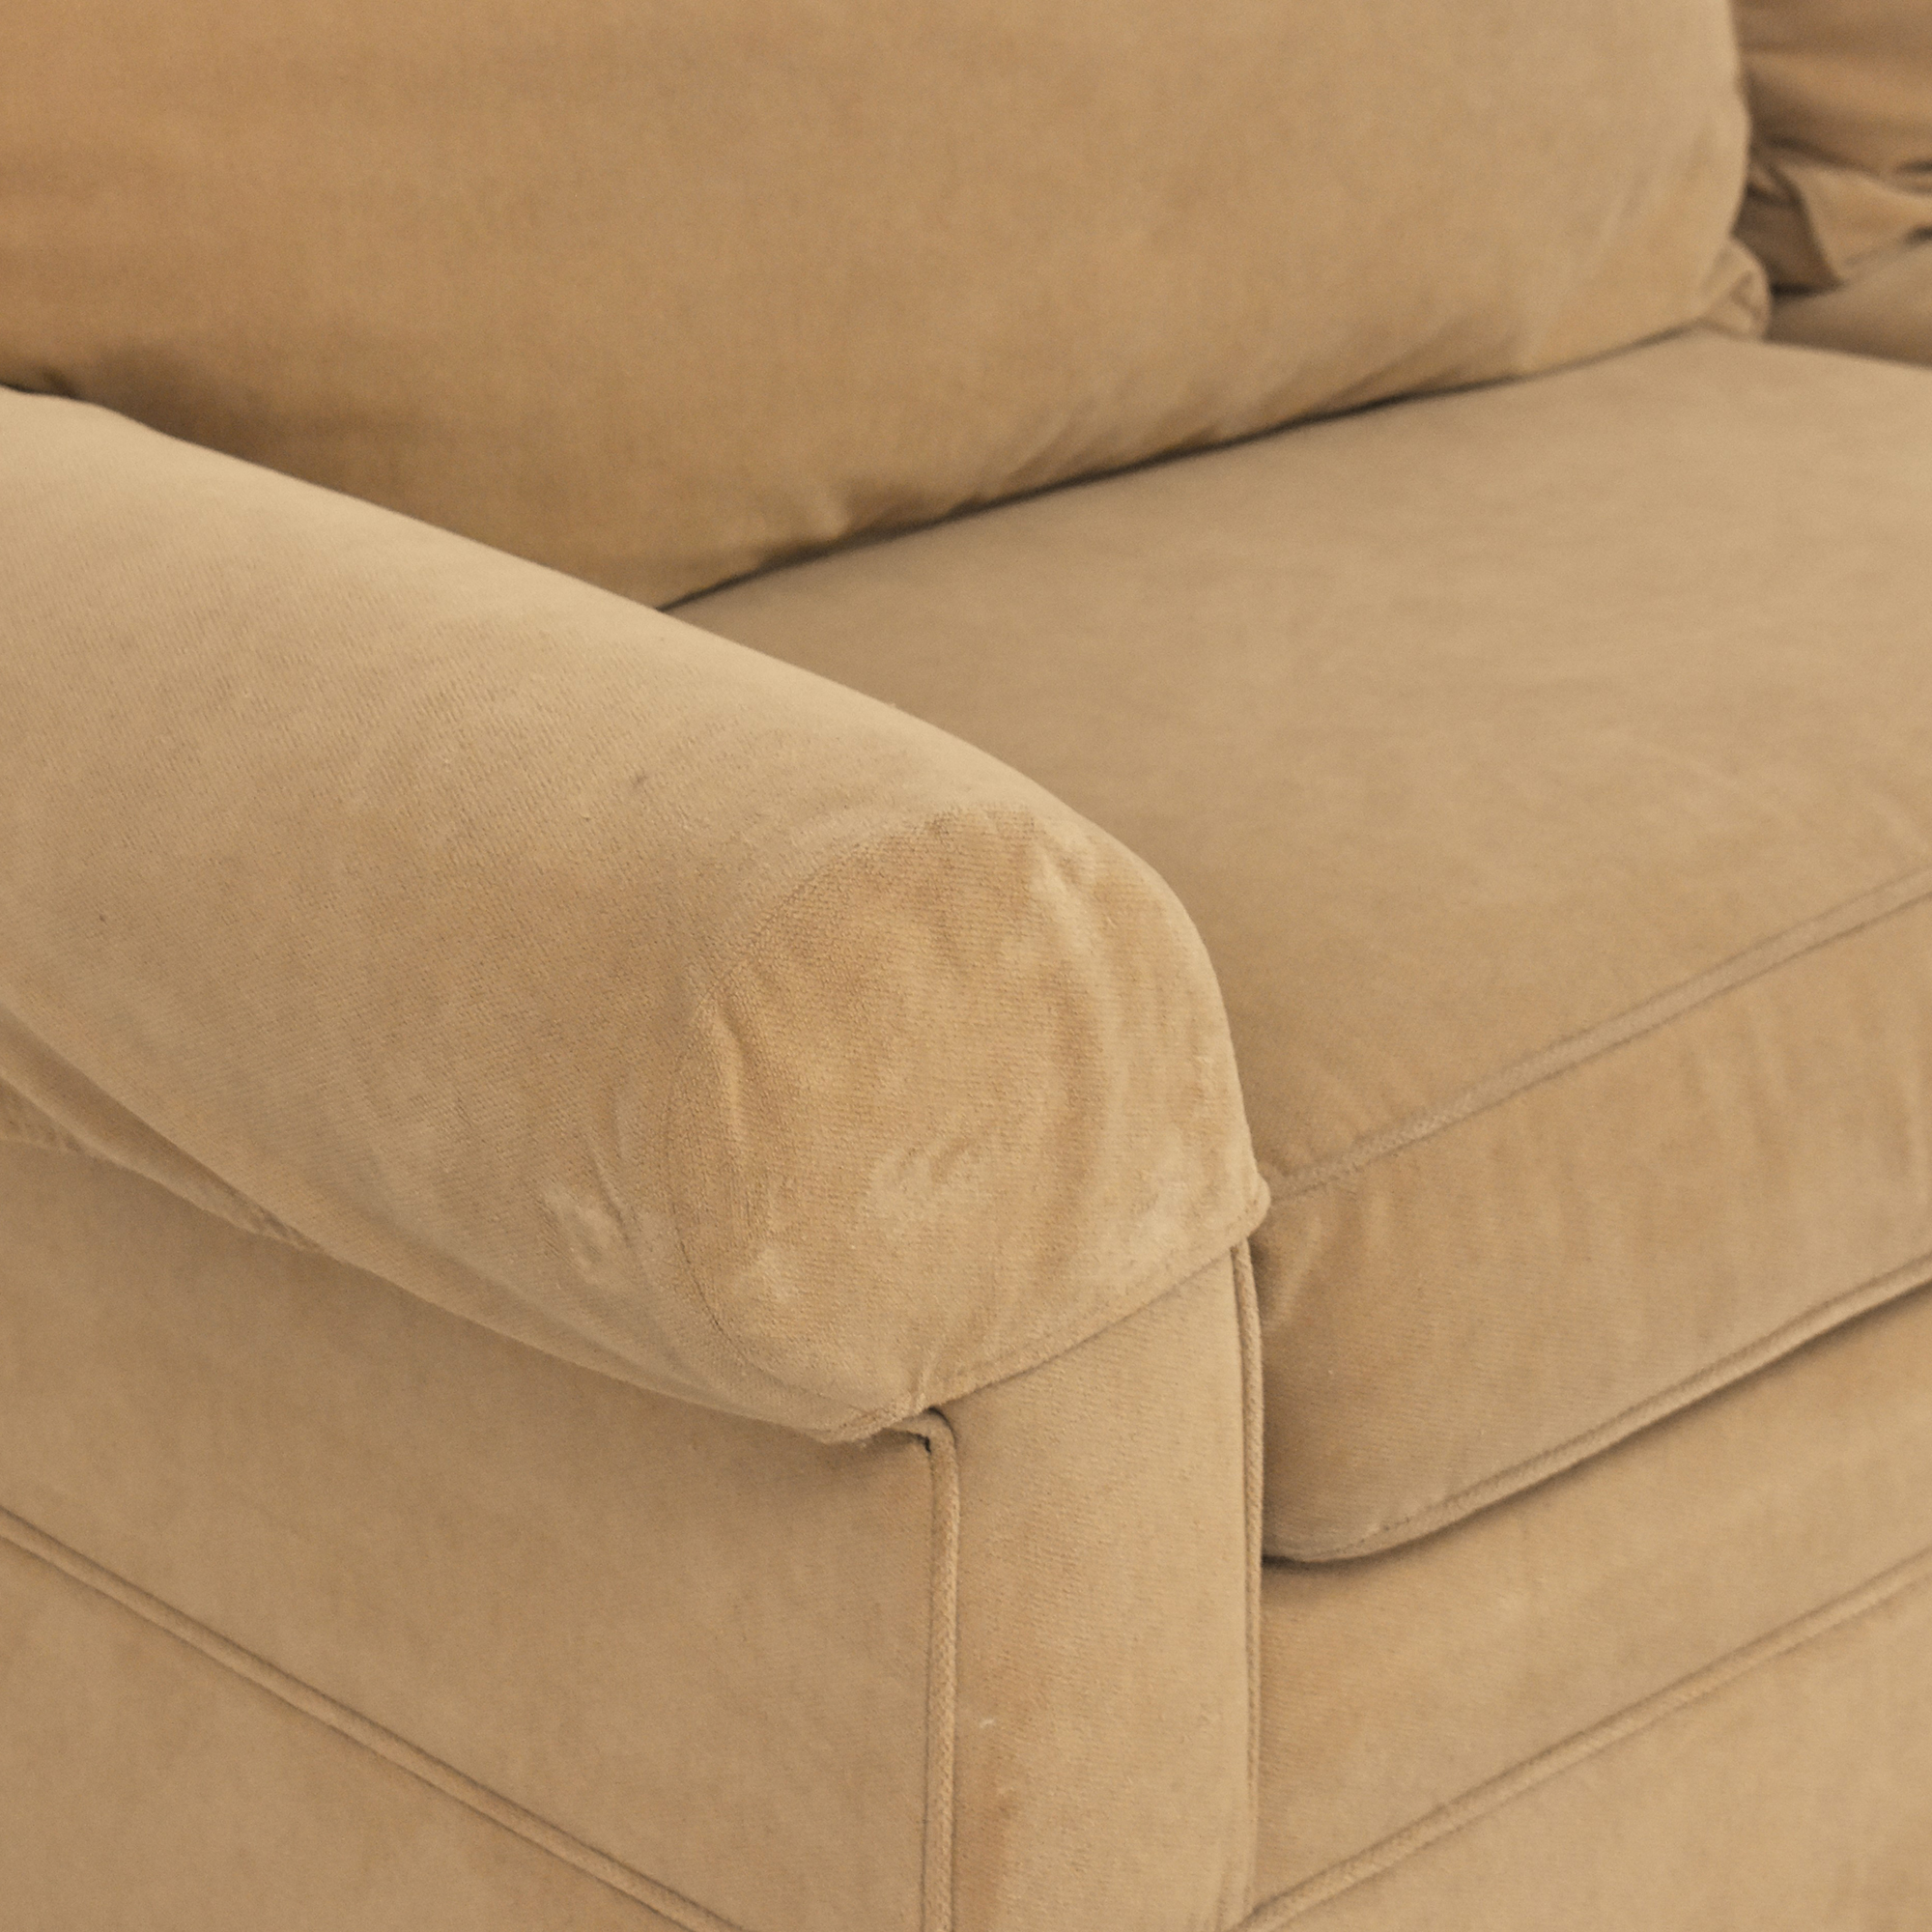 Ethan Allen Ethan Allen Skirted Roll Arm Sofa dimensions